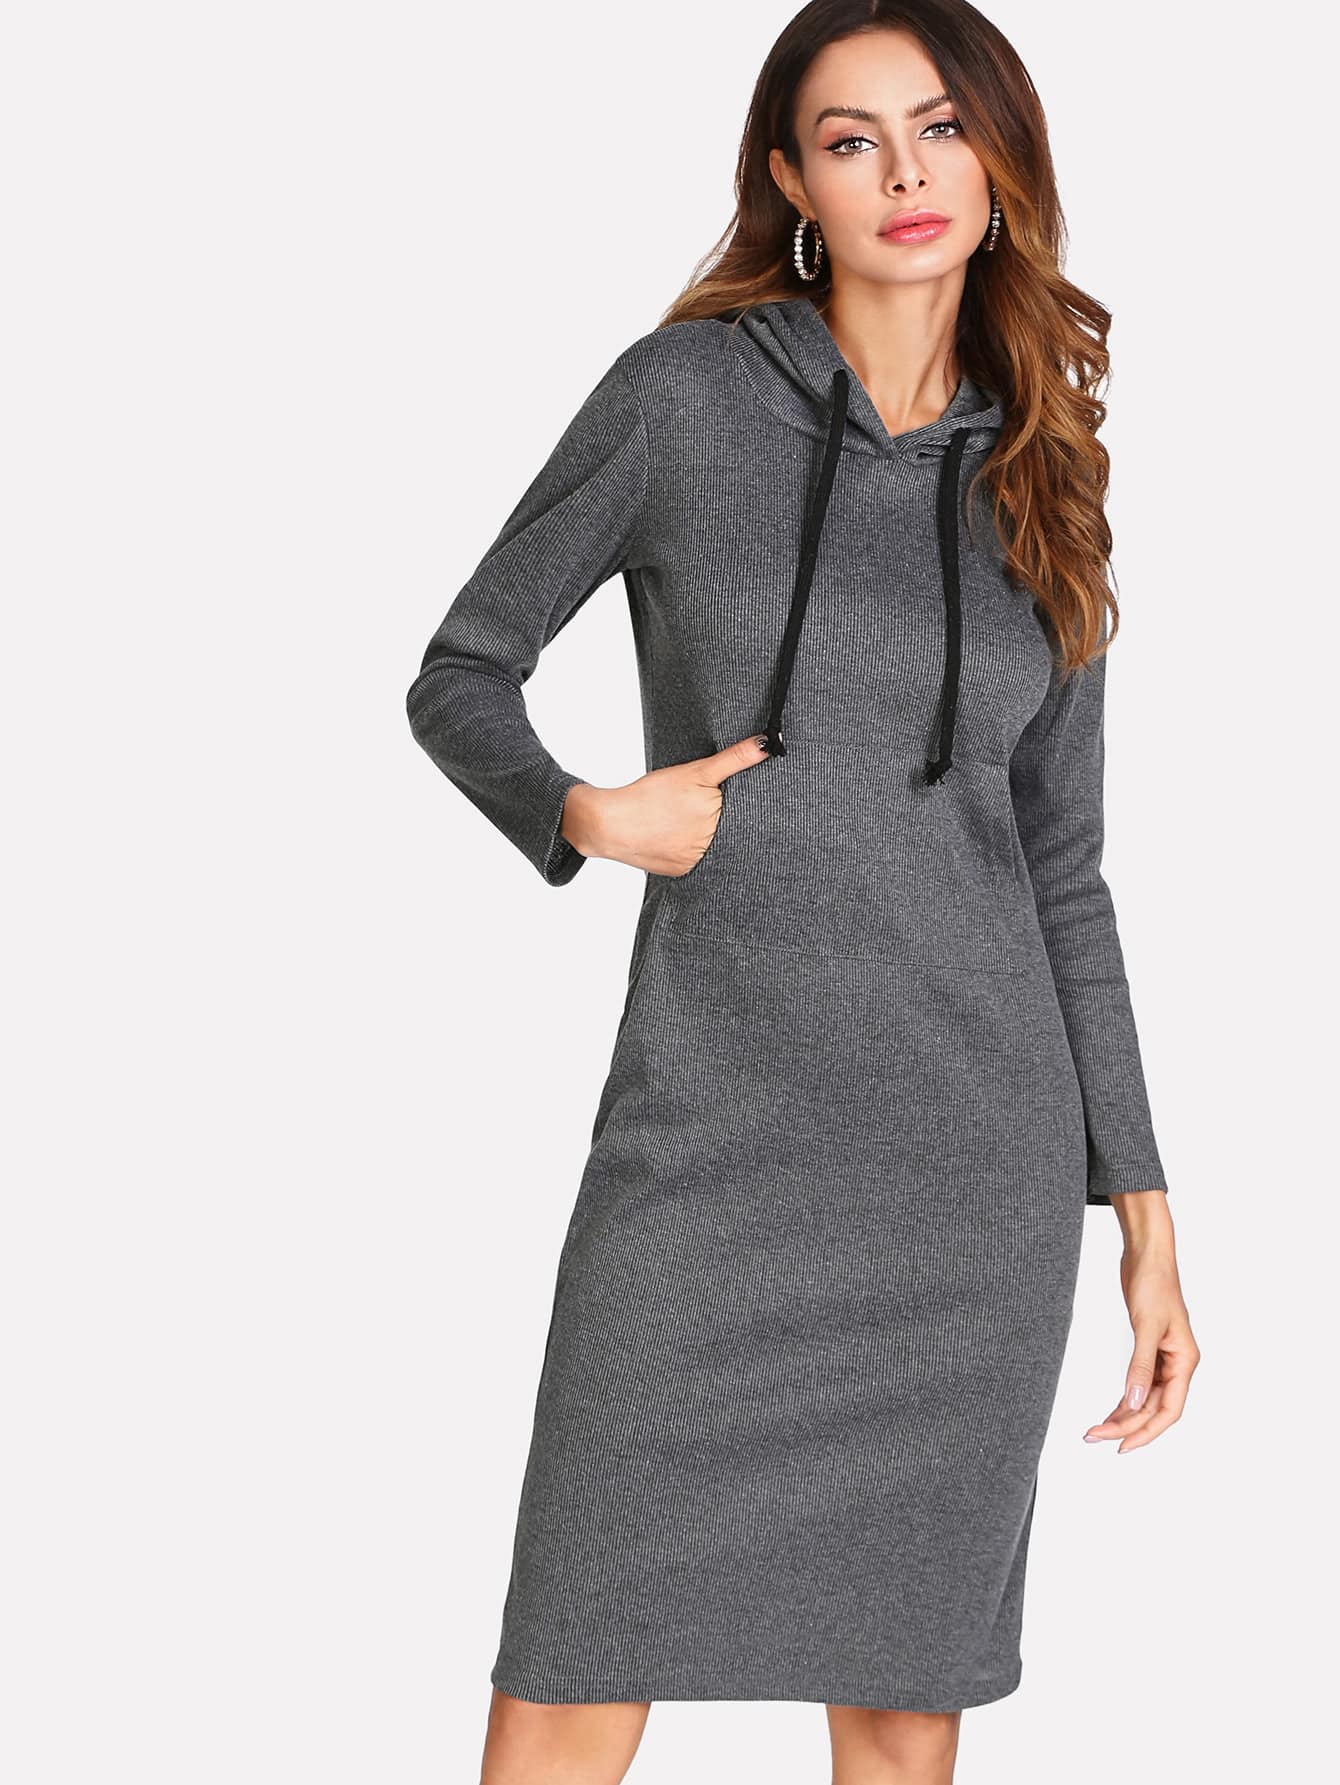 Rib Marled Knit Hooded Dress dress171215101